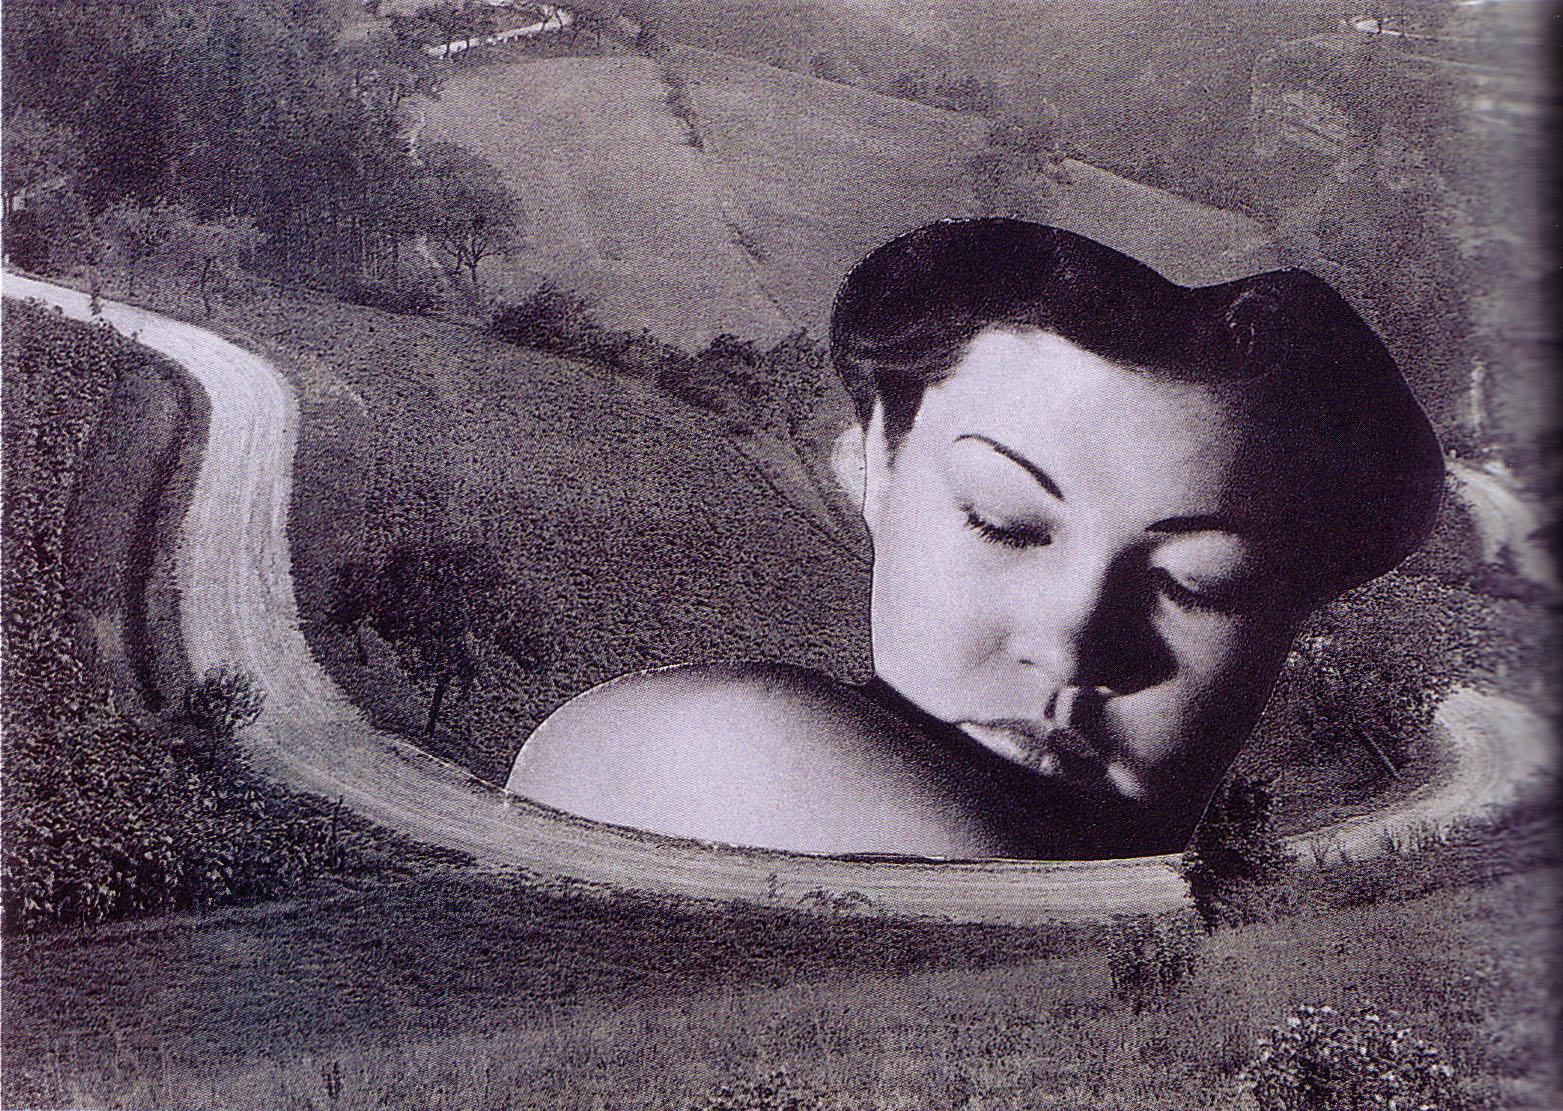 Karel Teige - Collage# 198 ,1941 (c) Nachlass Karel Teige